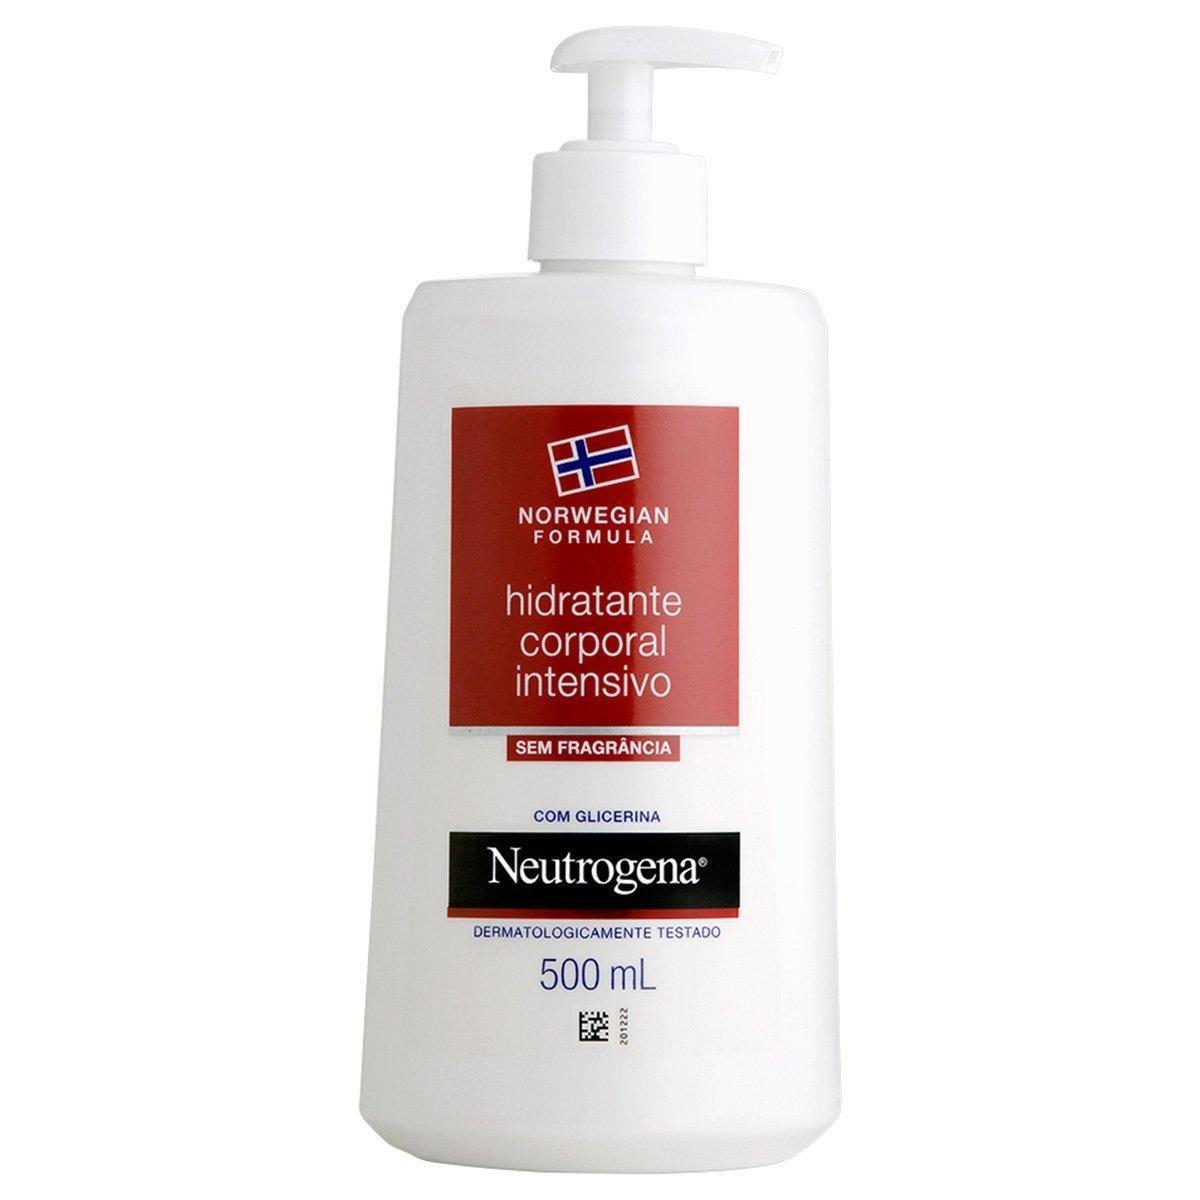 Creme Hidratante Neutrogena Norwegian sem Fragrância 500ml